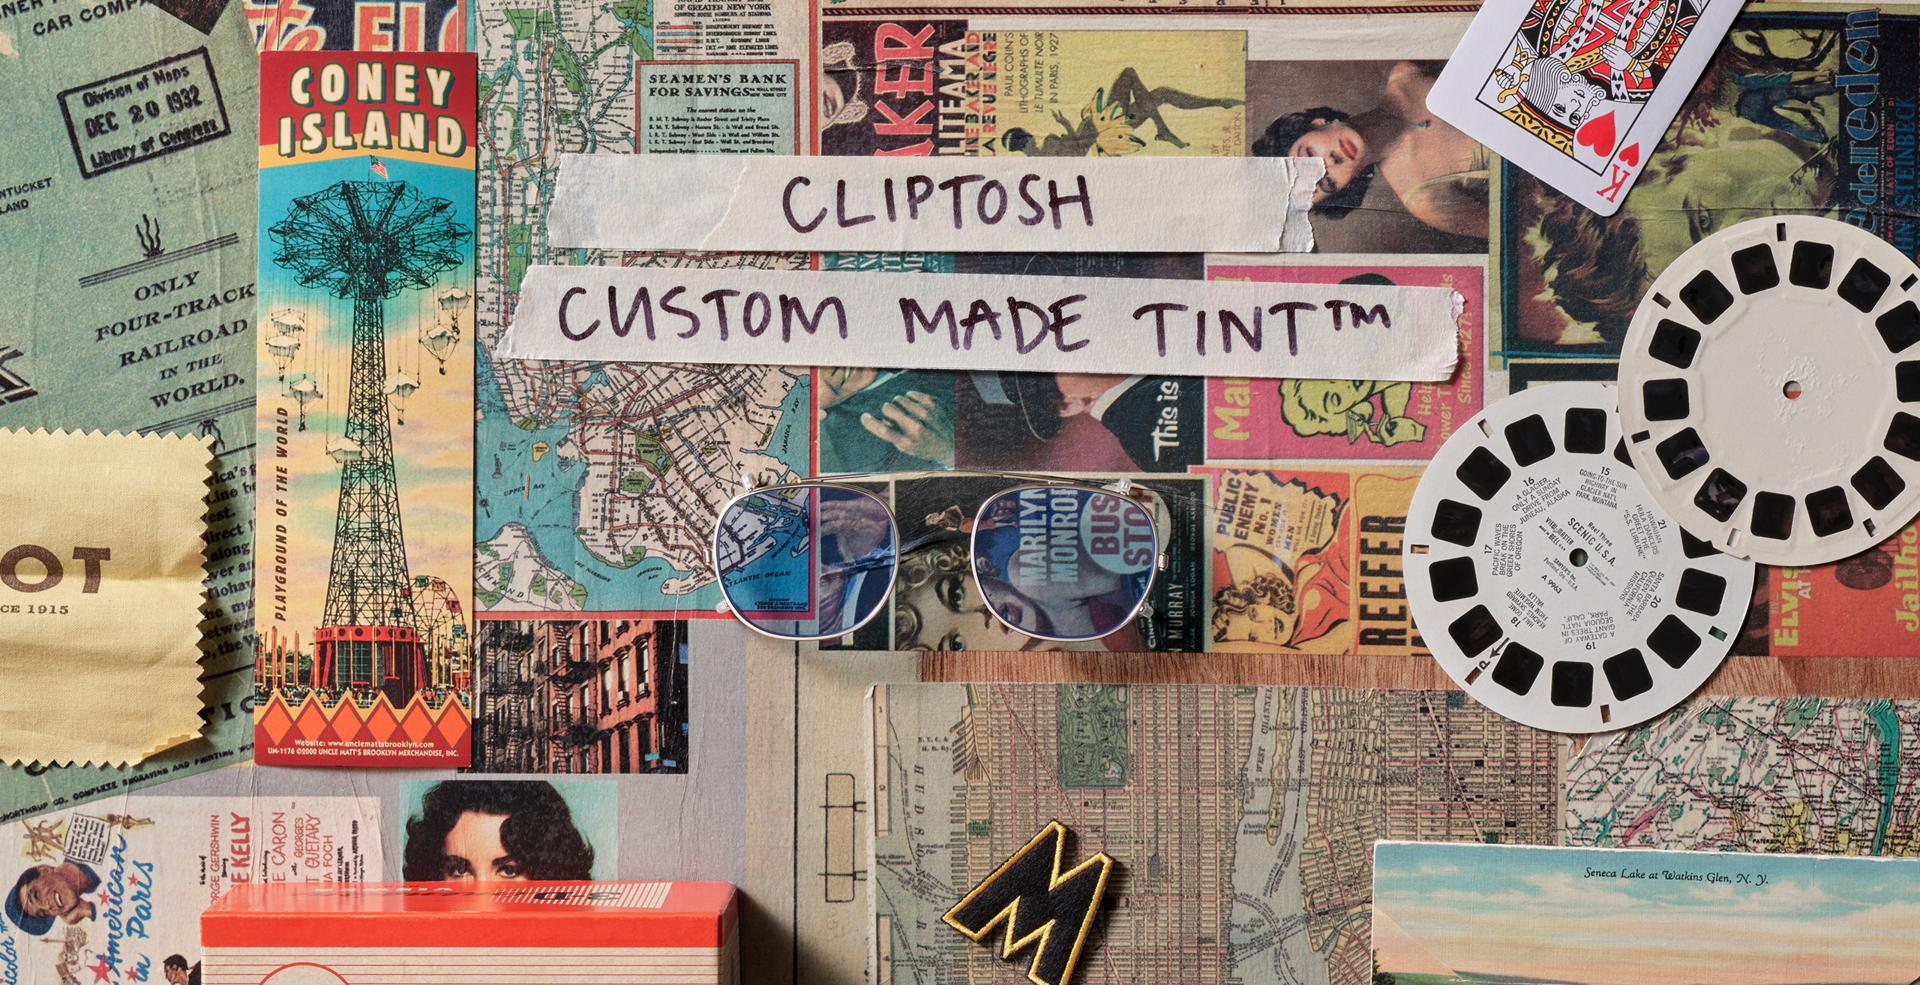 CLIPTOSH CUSTOM MADE TINT™